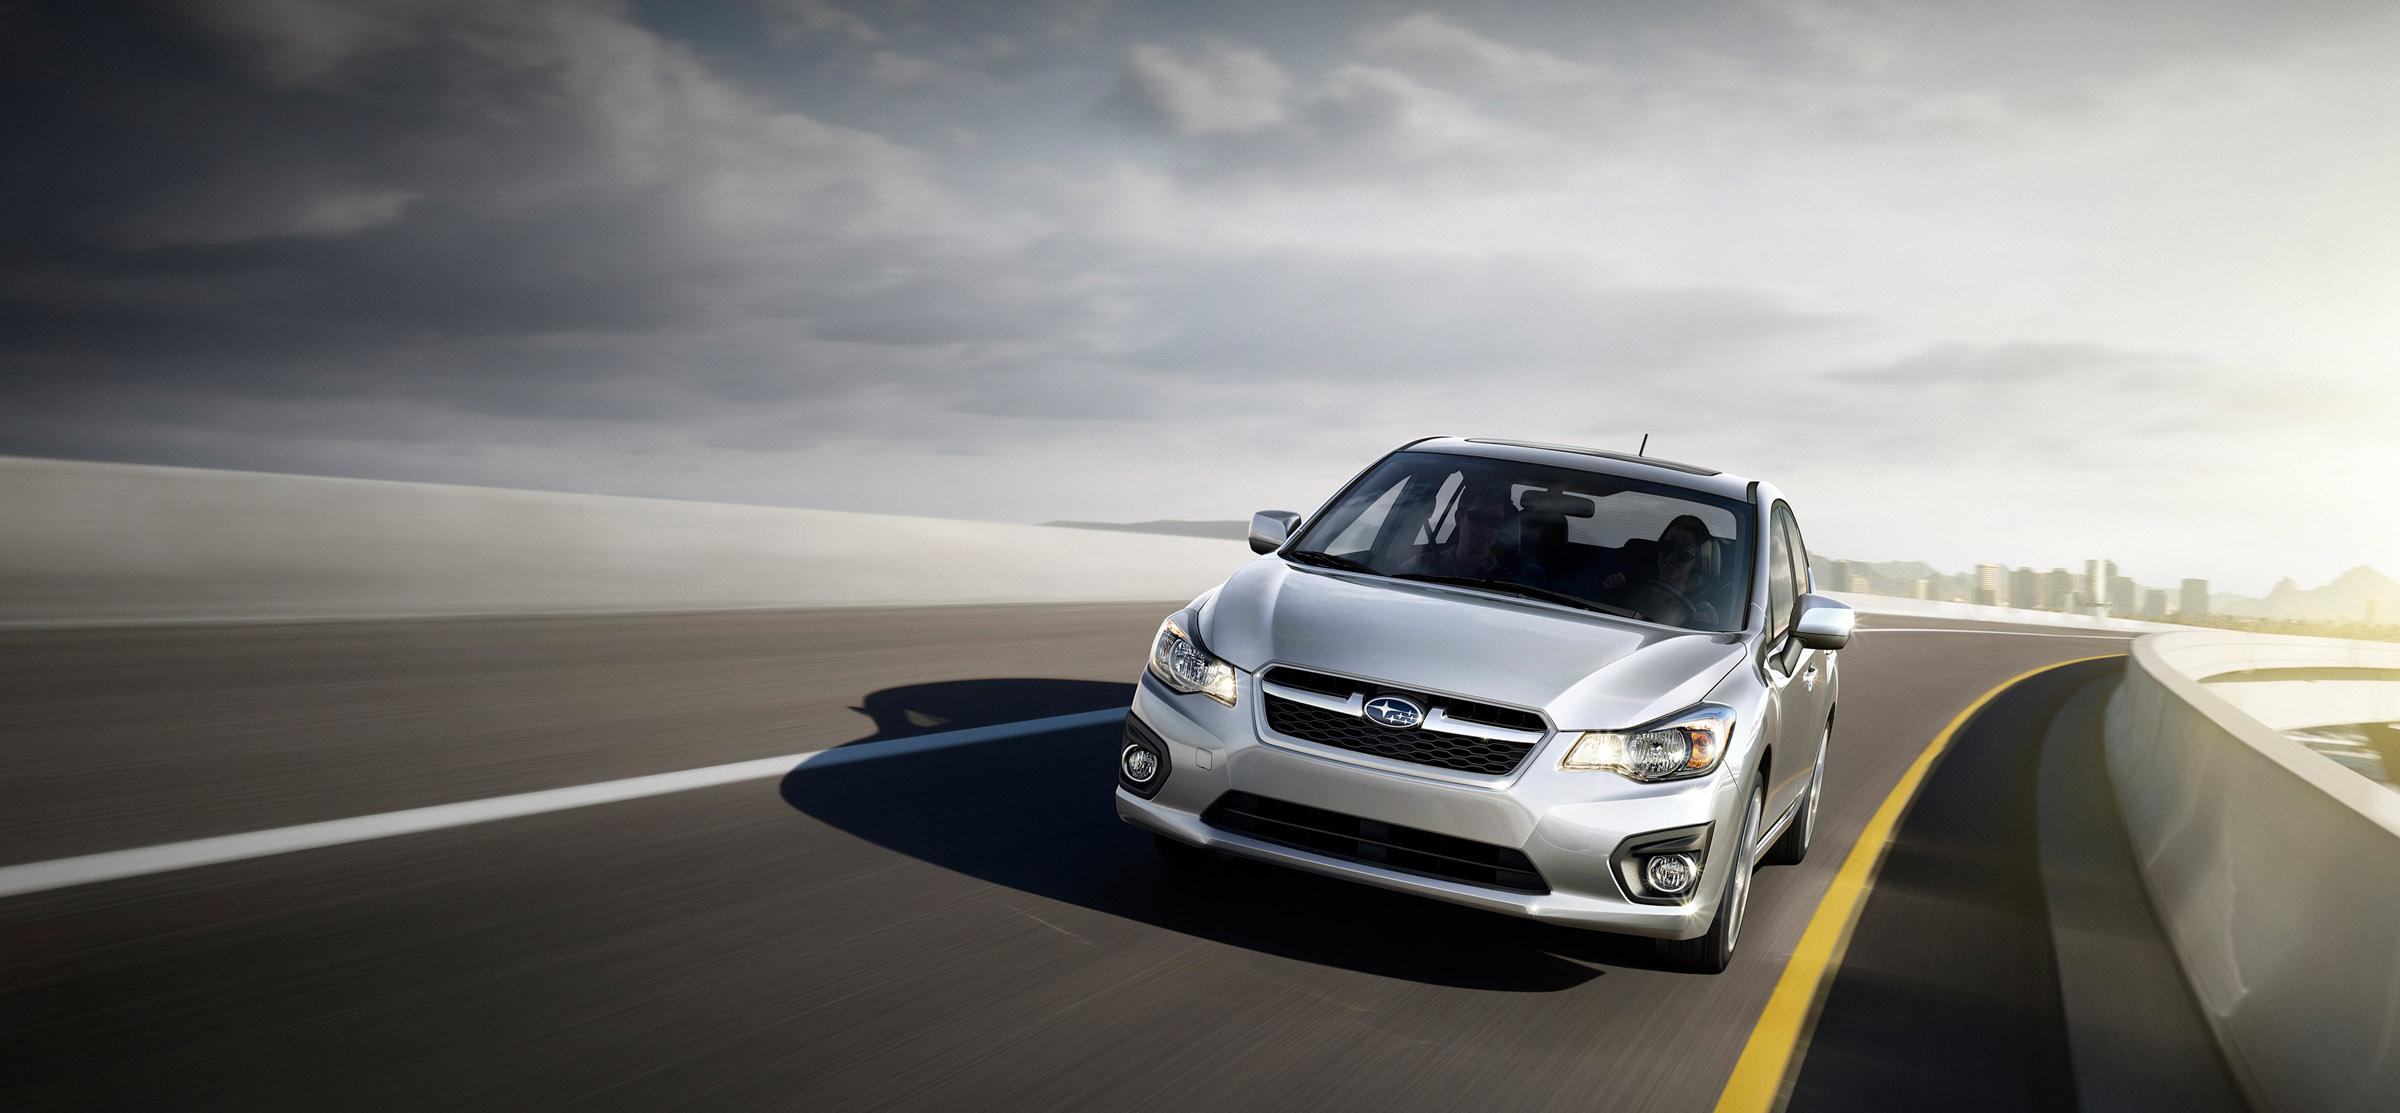 2012 - Subaru Impreza 2-0i лимитированная четвертая версия (фотографии) - фотография №1